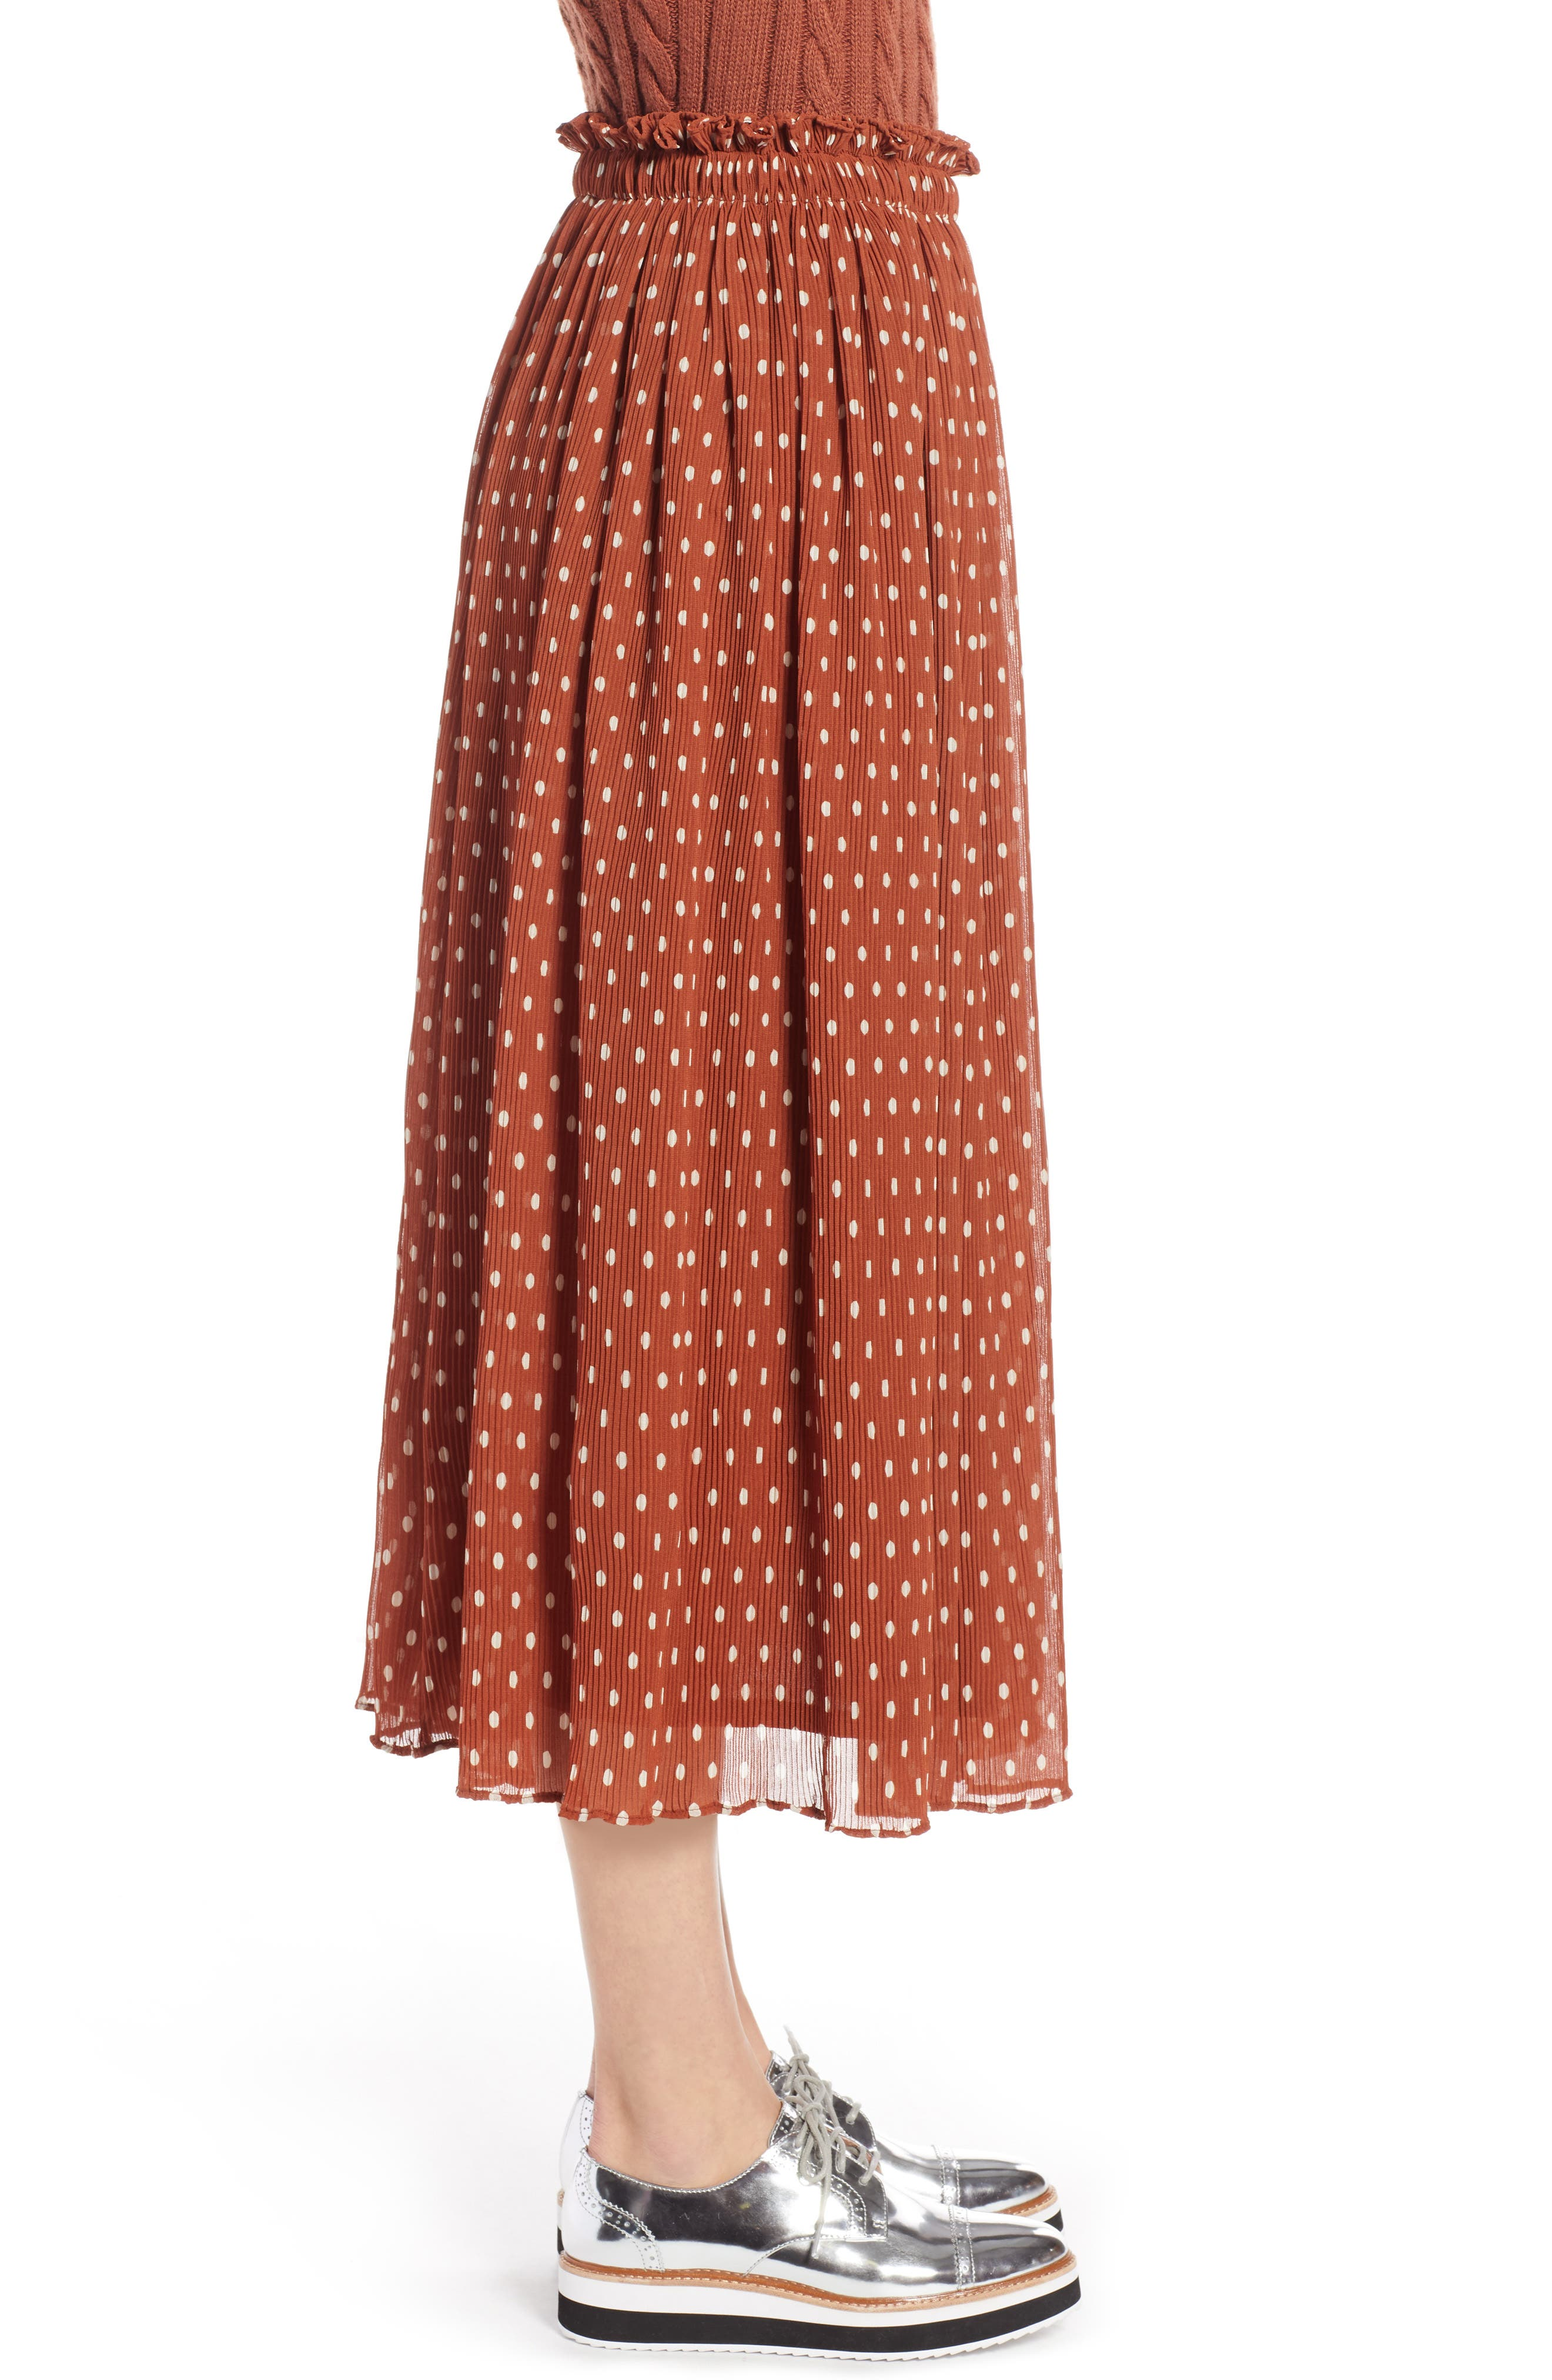 x Atlantic-Pacific Crinkle Midi Skirt,                             Alternate thumbnail 4, color,                             RUST SPACED DOT